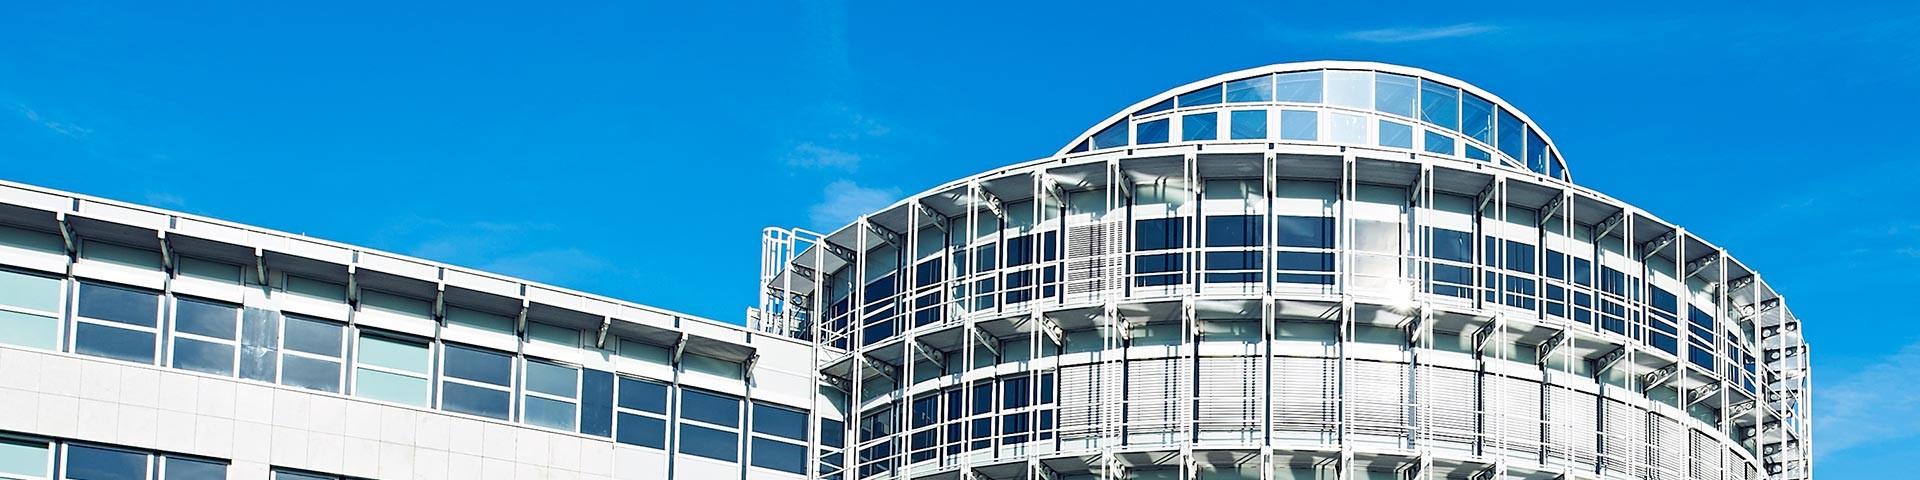 Heise Medien GmbH & Co. KG | LinkedIn